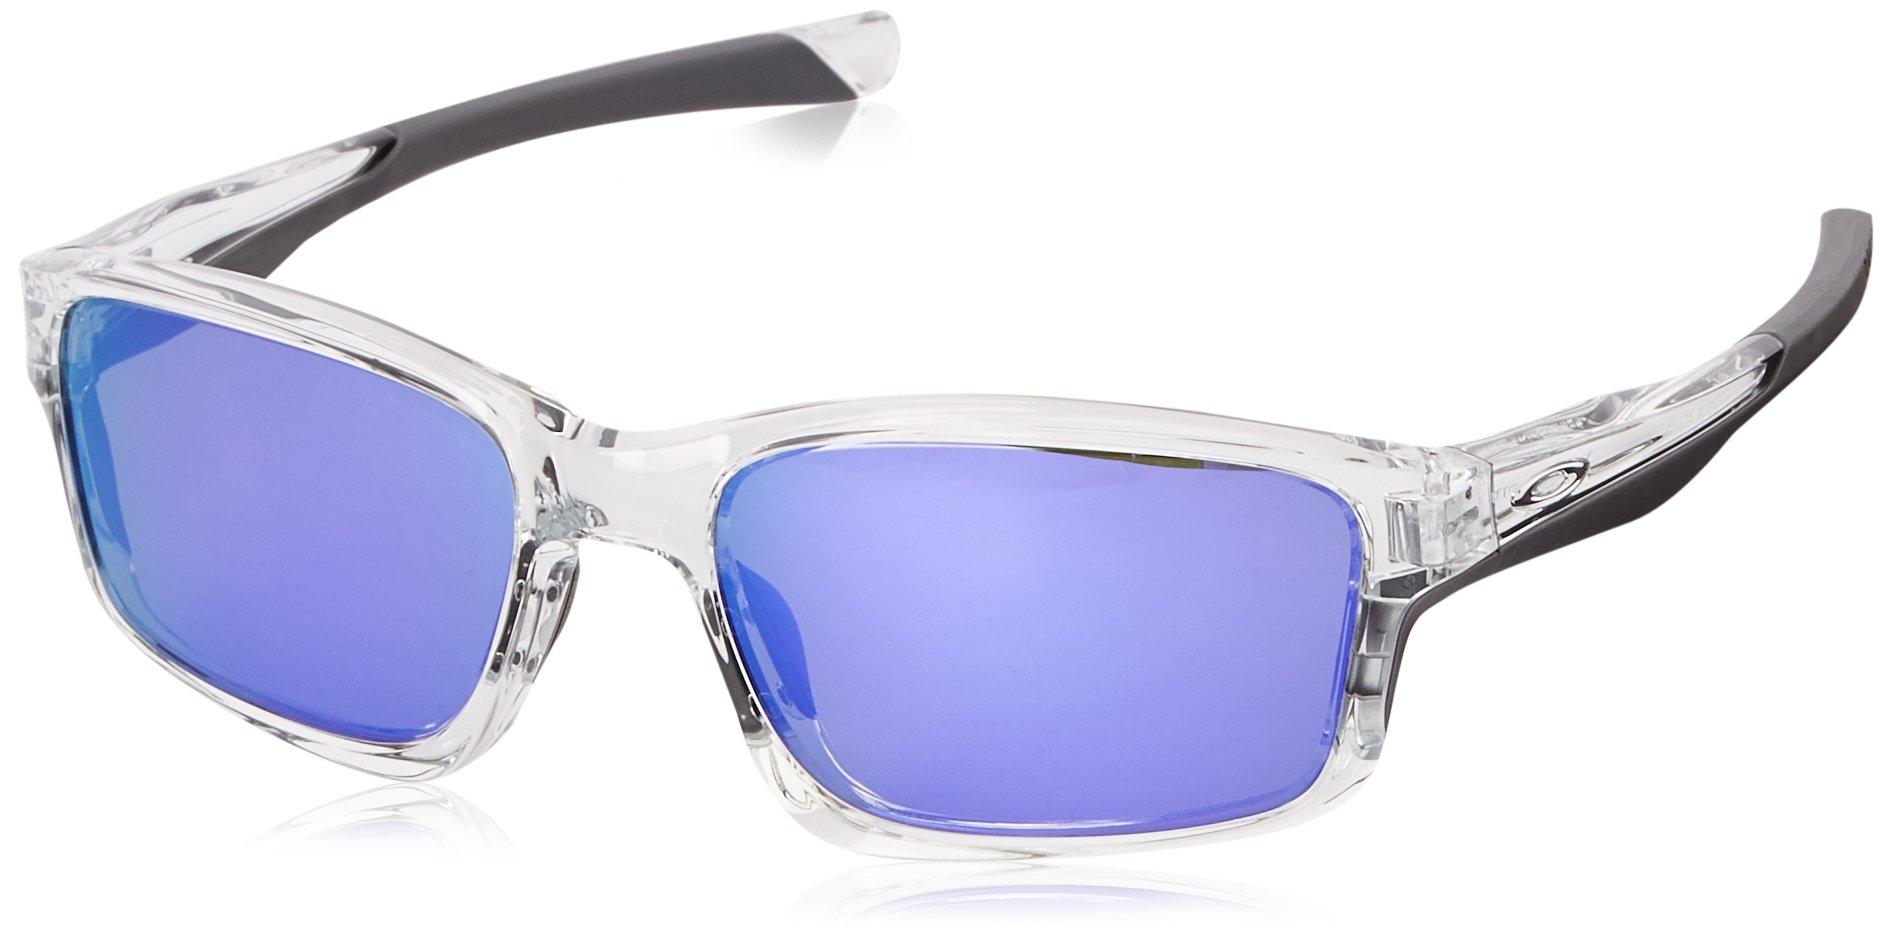 Oakley Mens Chailink OO9247-06 Non-Polarized Ractangular Eyeglasses, Polished Clear, 57 mm